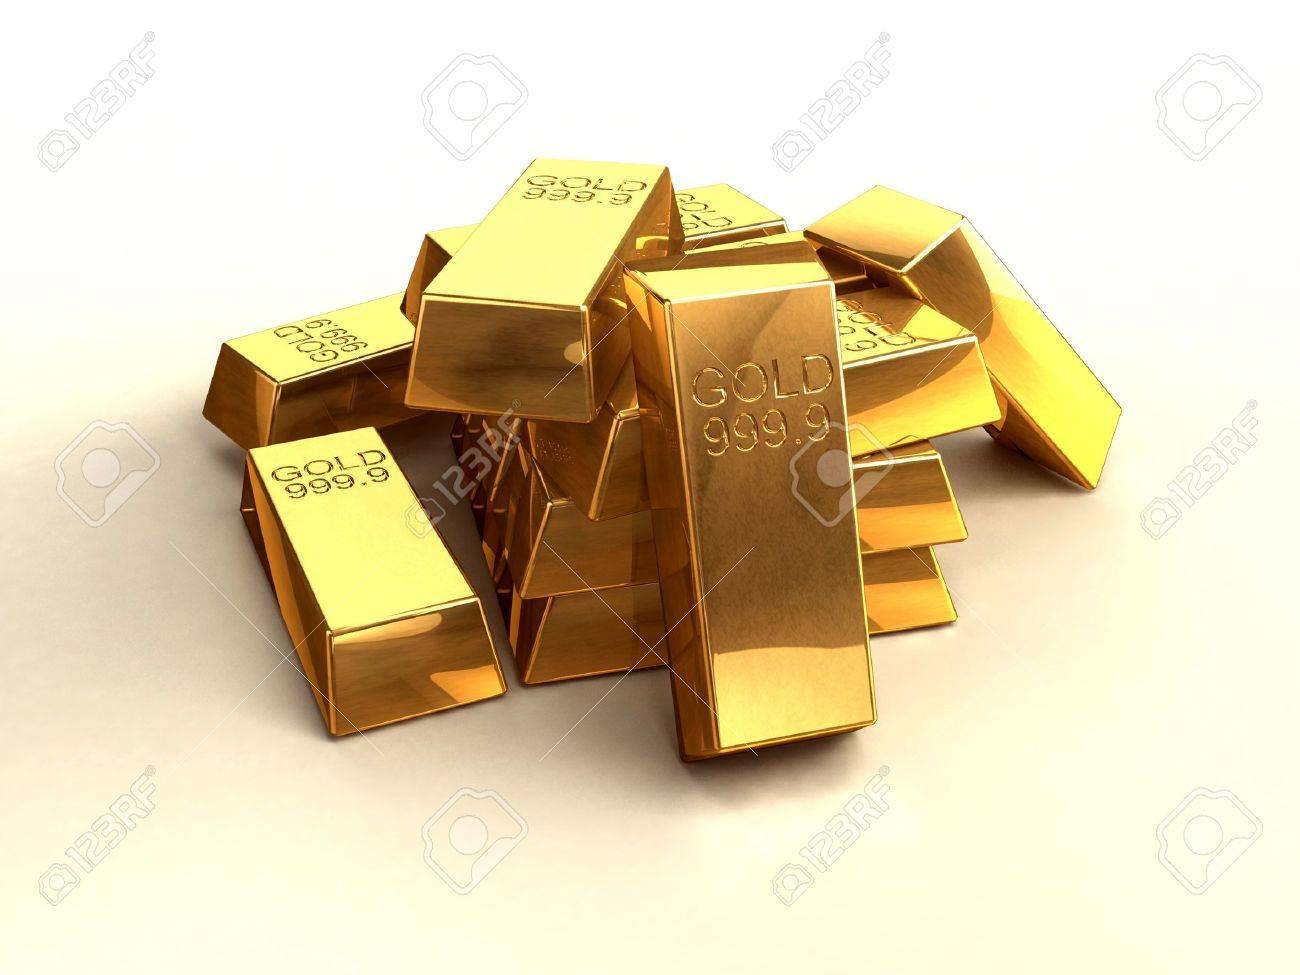 Gold bars Stock Photo - 13920017